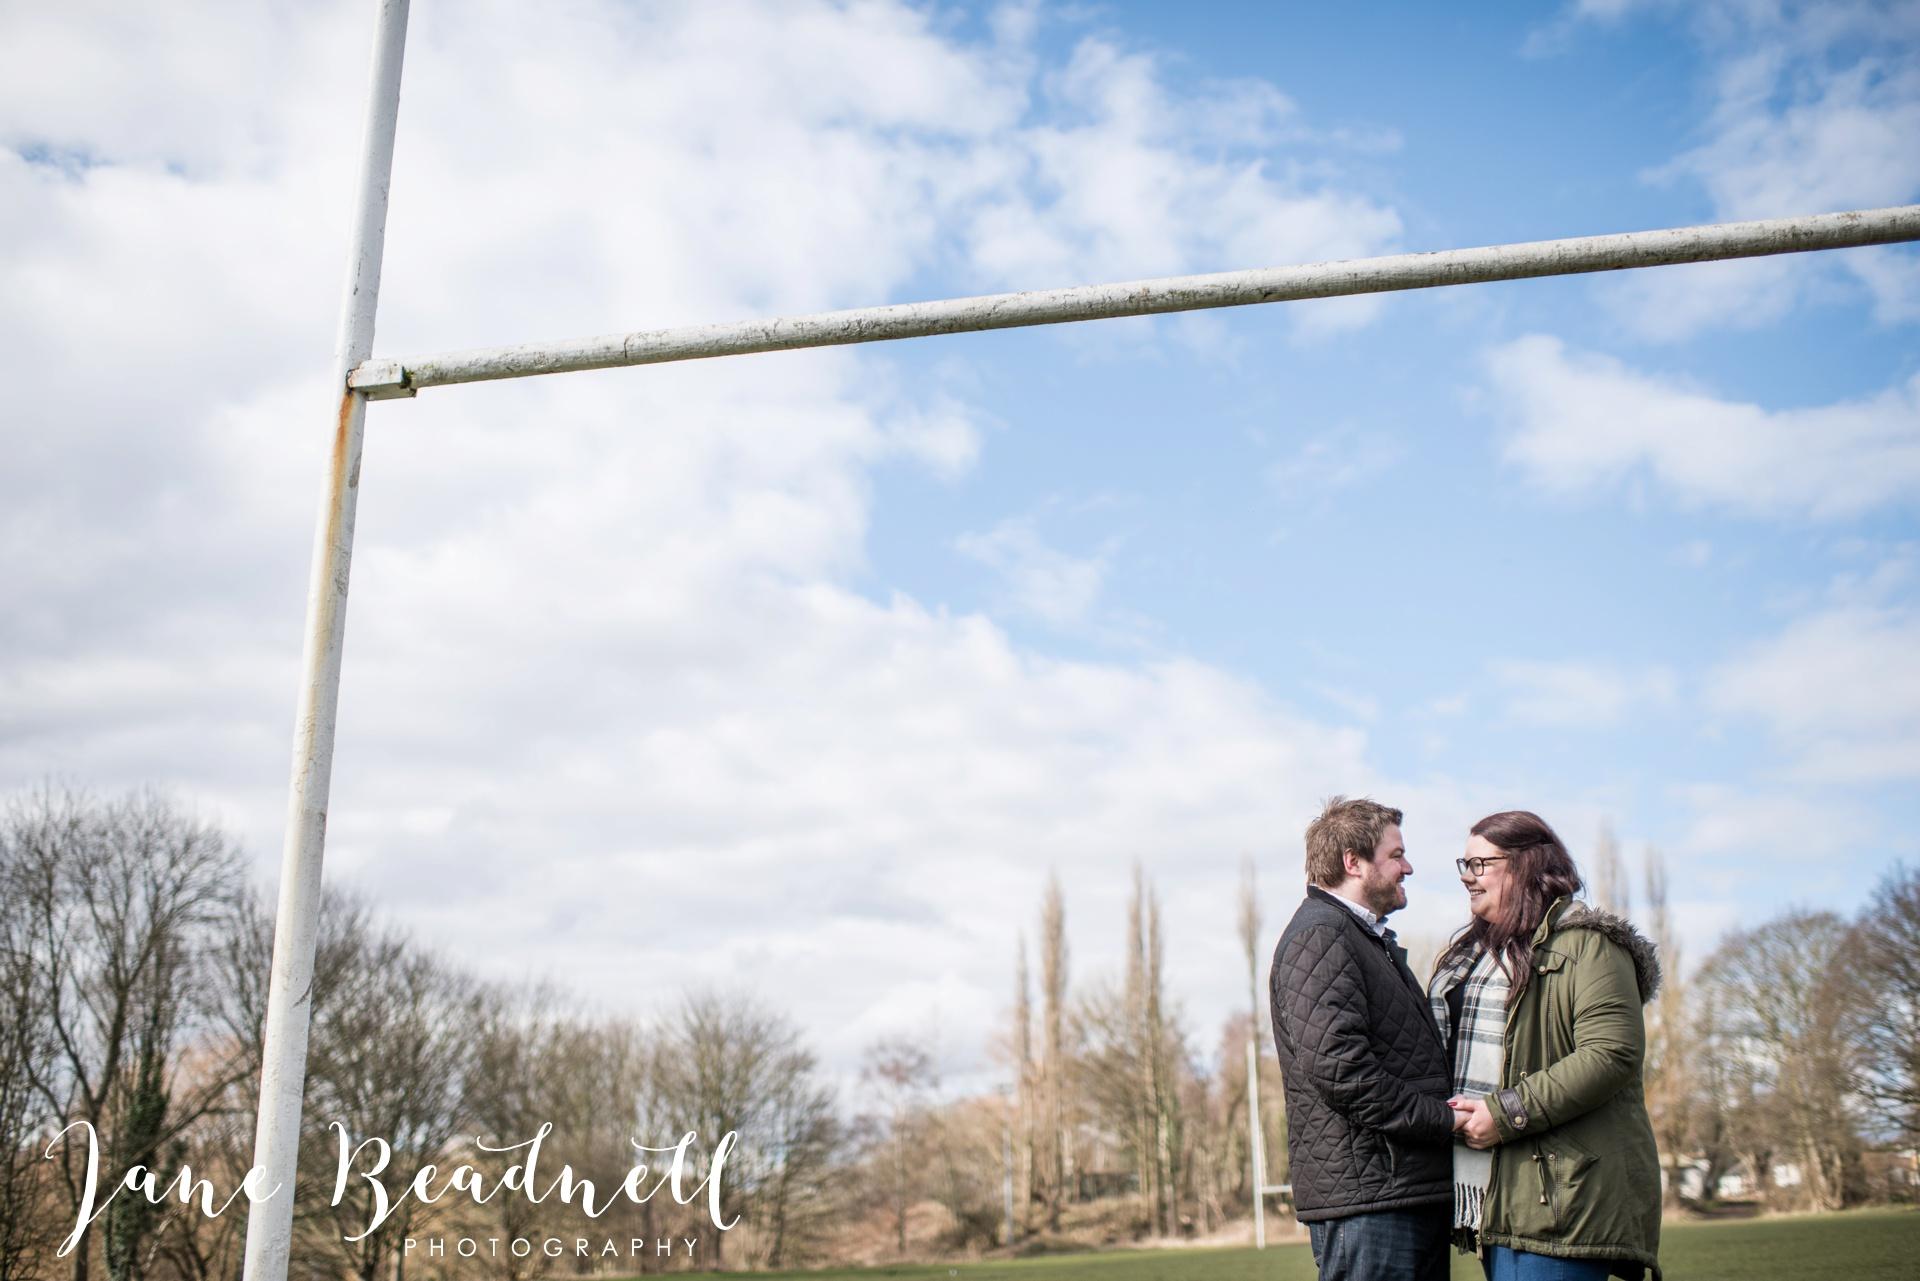 fine art engagement photography Kirkstall Abbey Leeds jane beadnell photography_0028